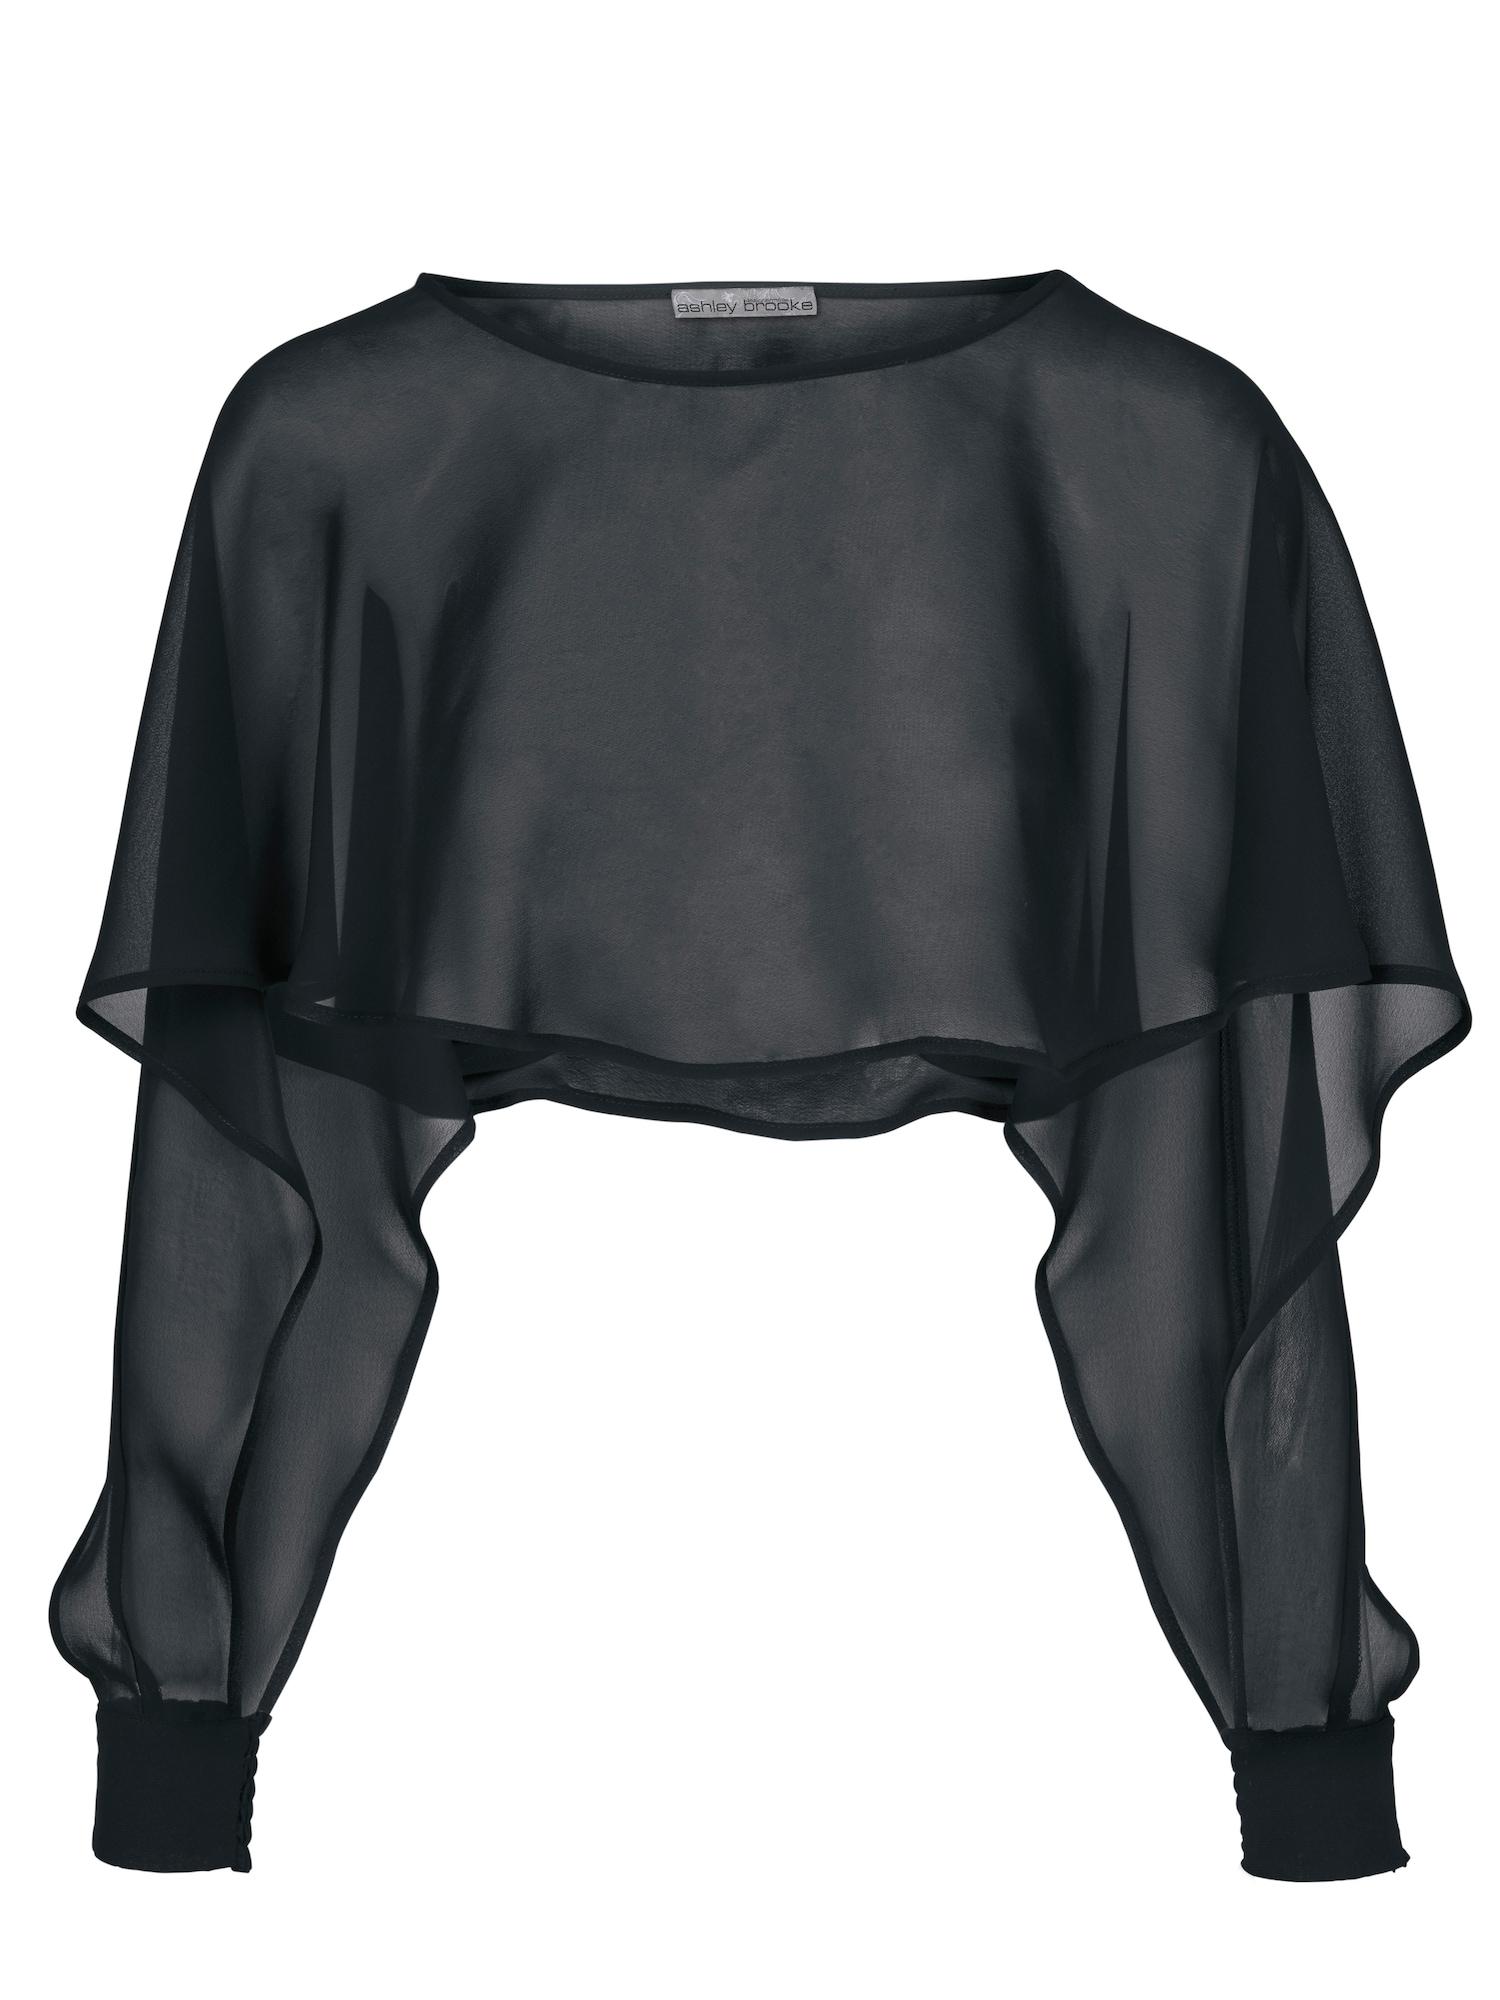 Pláštěnka černá Heine